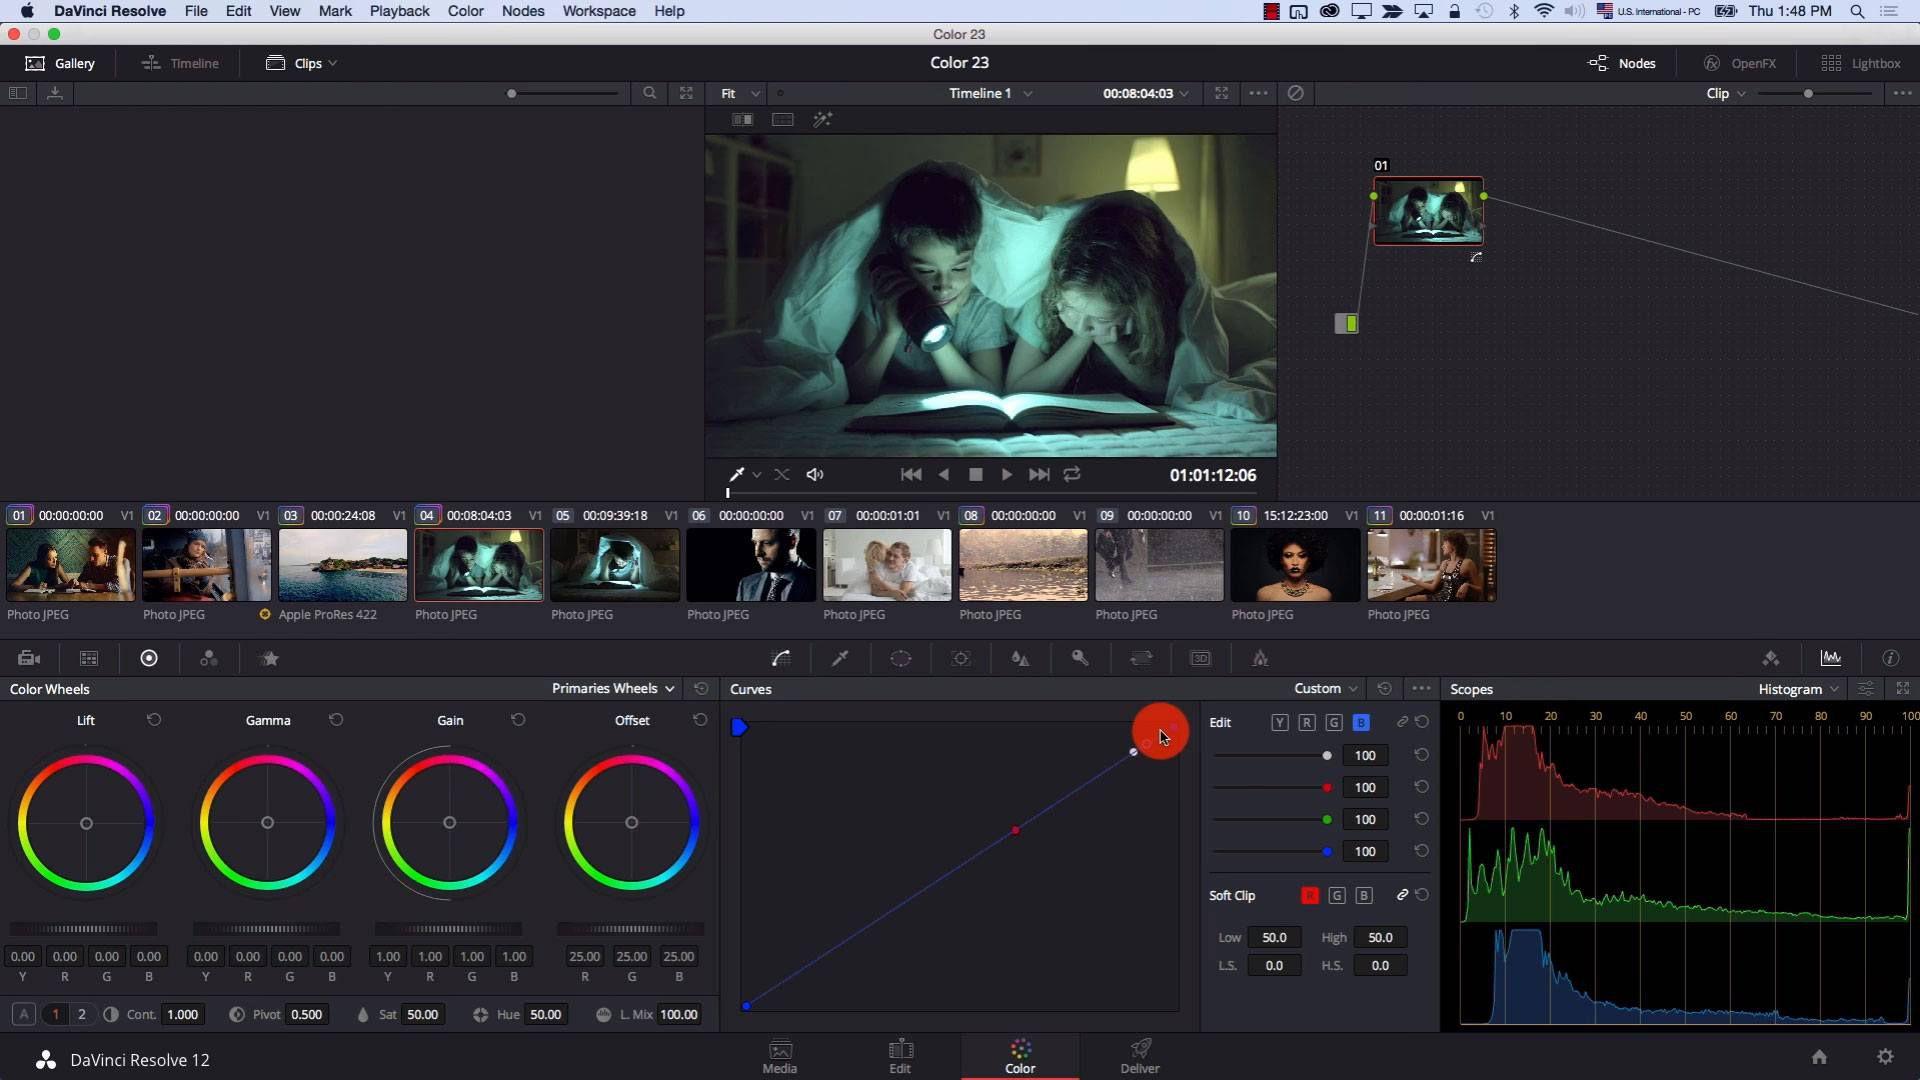 cara mengedit video dengan aplikasi terbaik